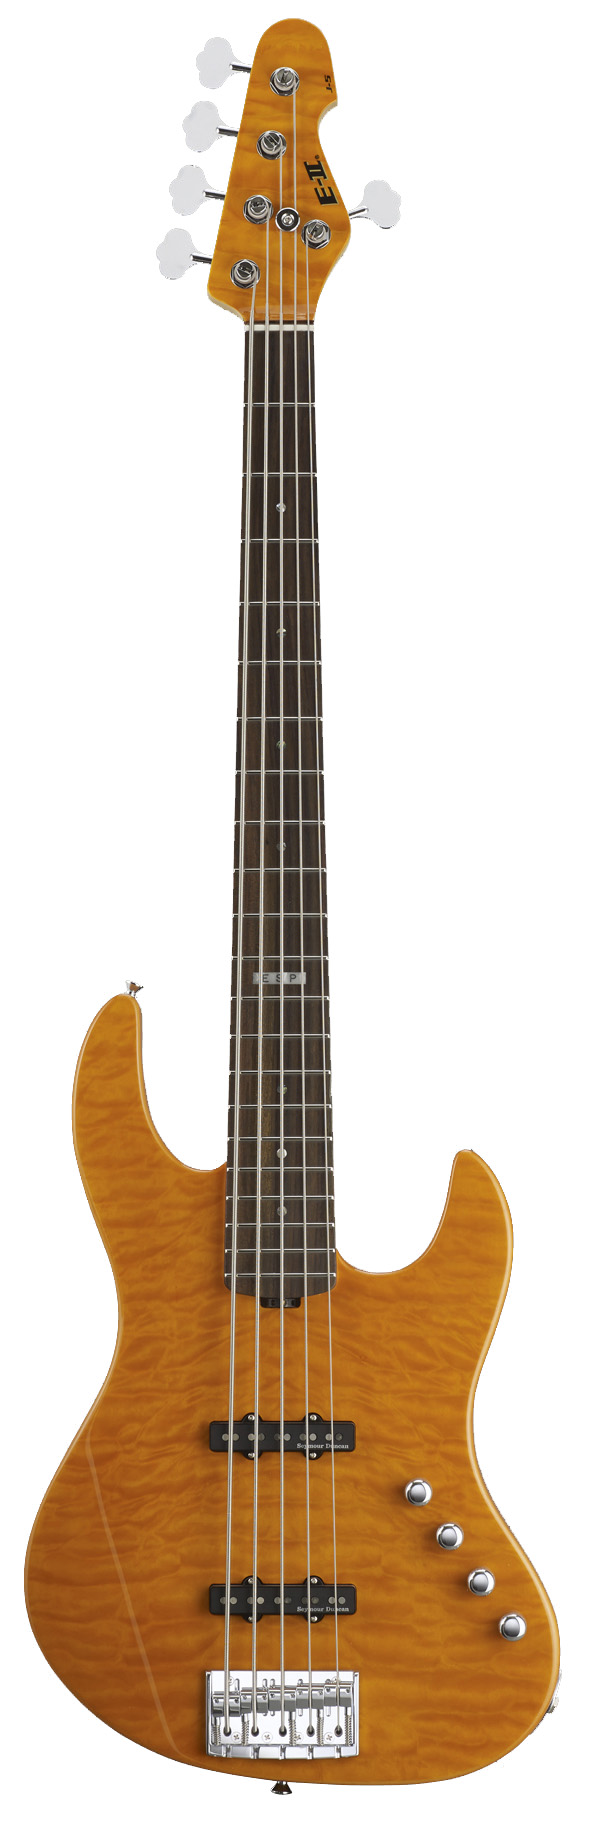 ESP J-5 QM AMB E-II J Series Chambered Ash Body Electric Bass Guitar with Amber Finish